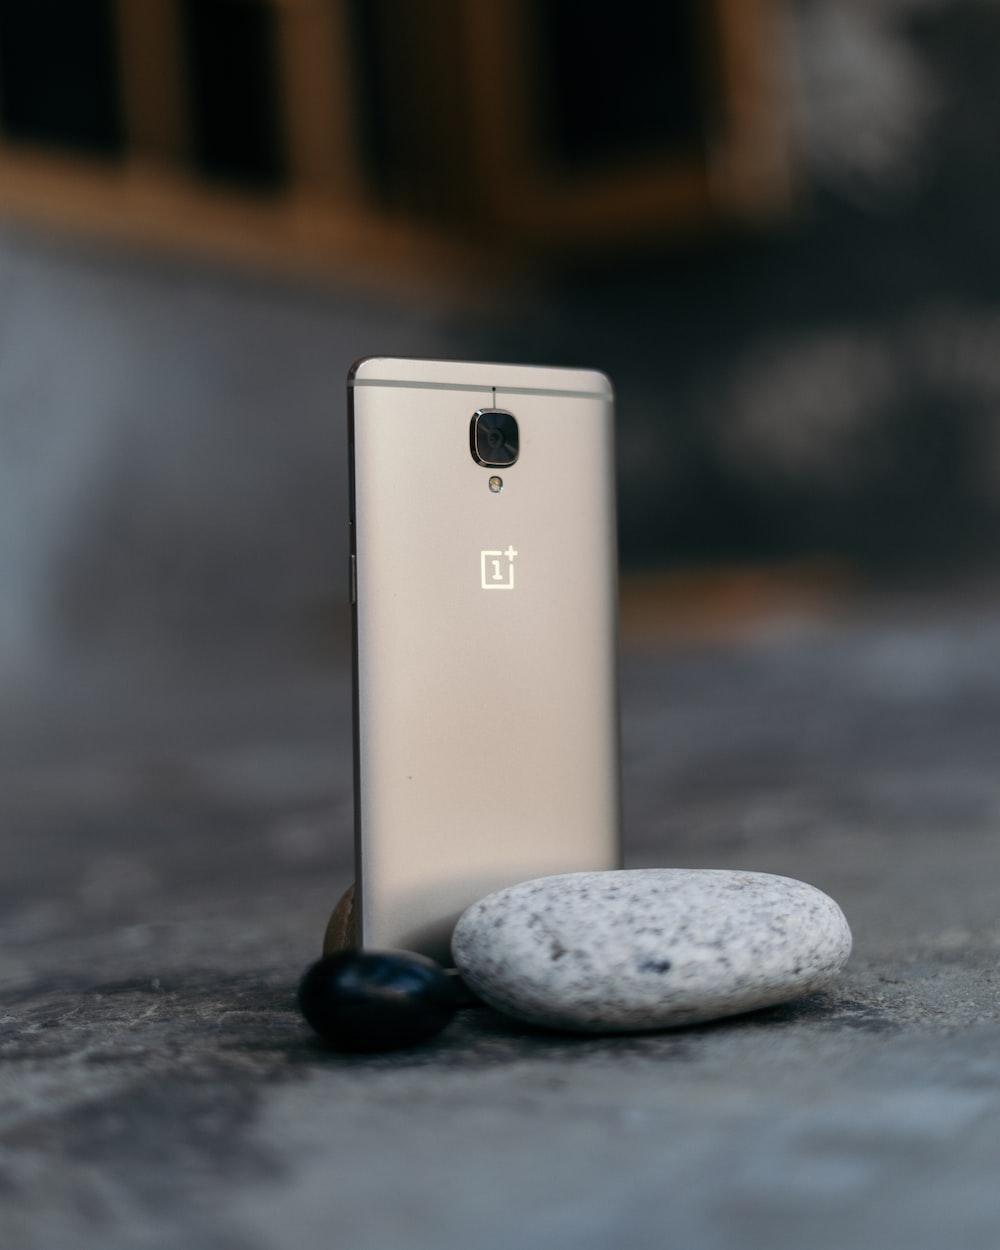 gold iphone 6 on black stone